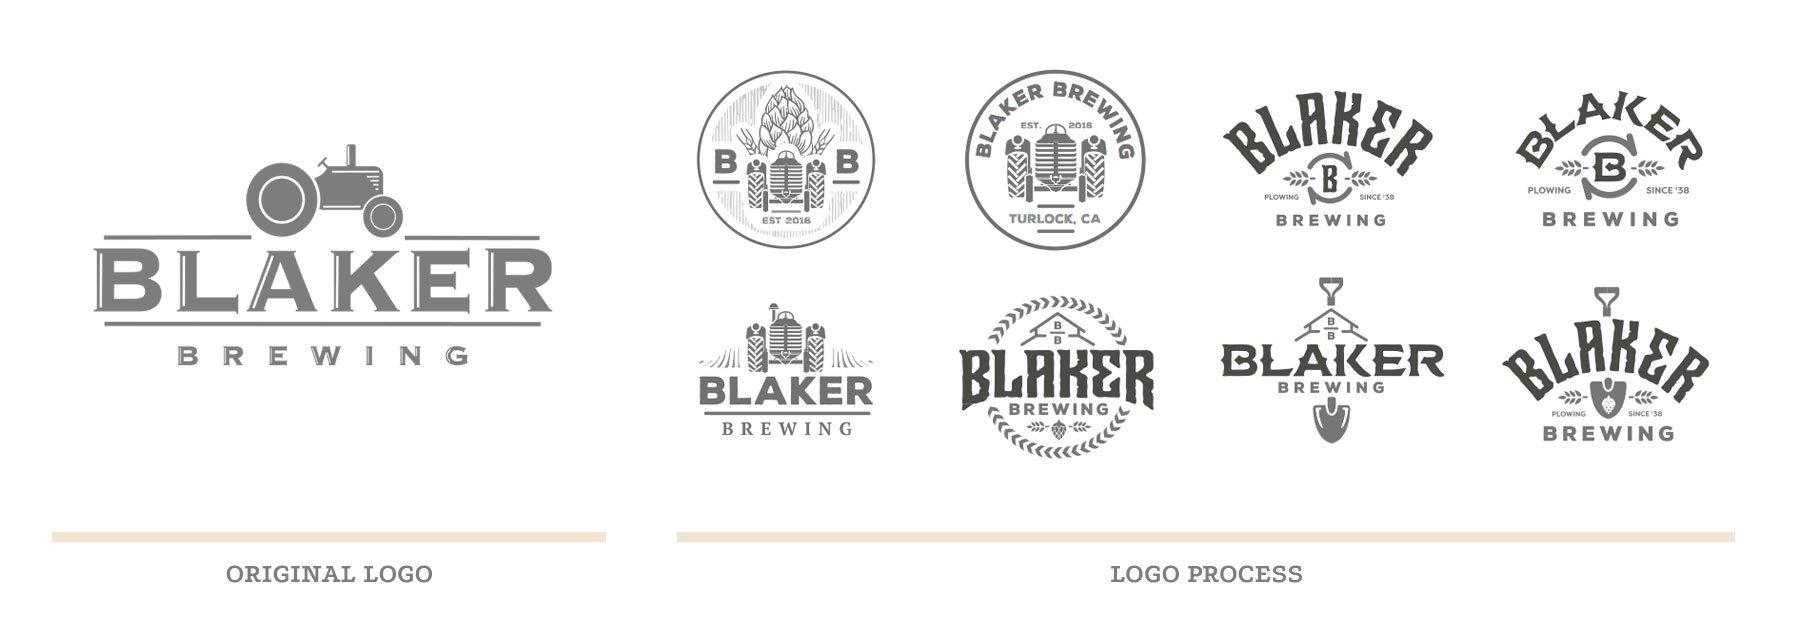 Blaker Brewing Logo Process